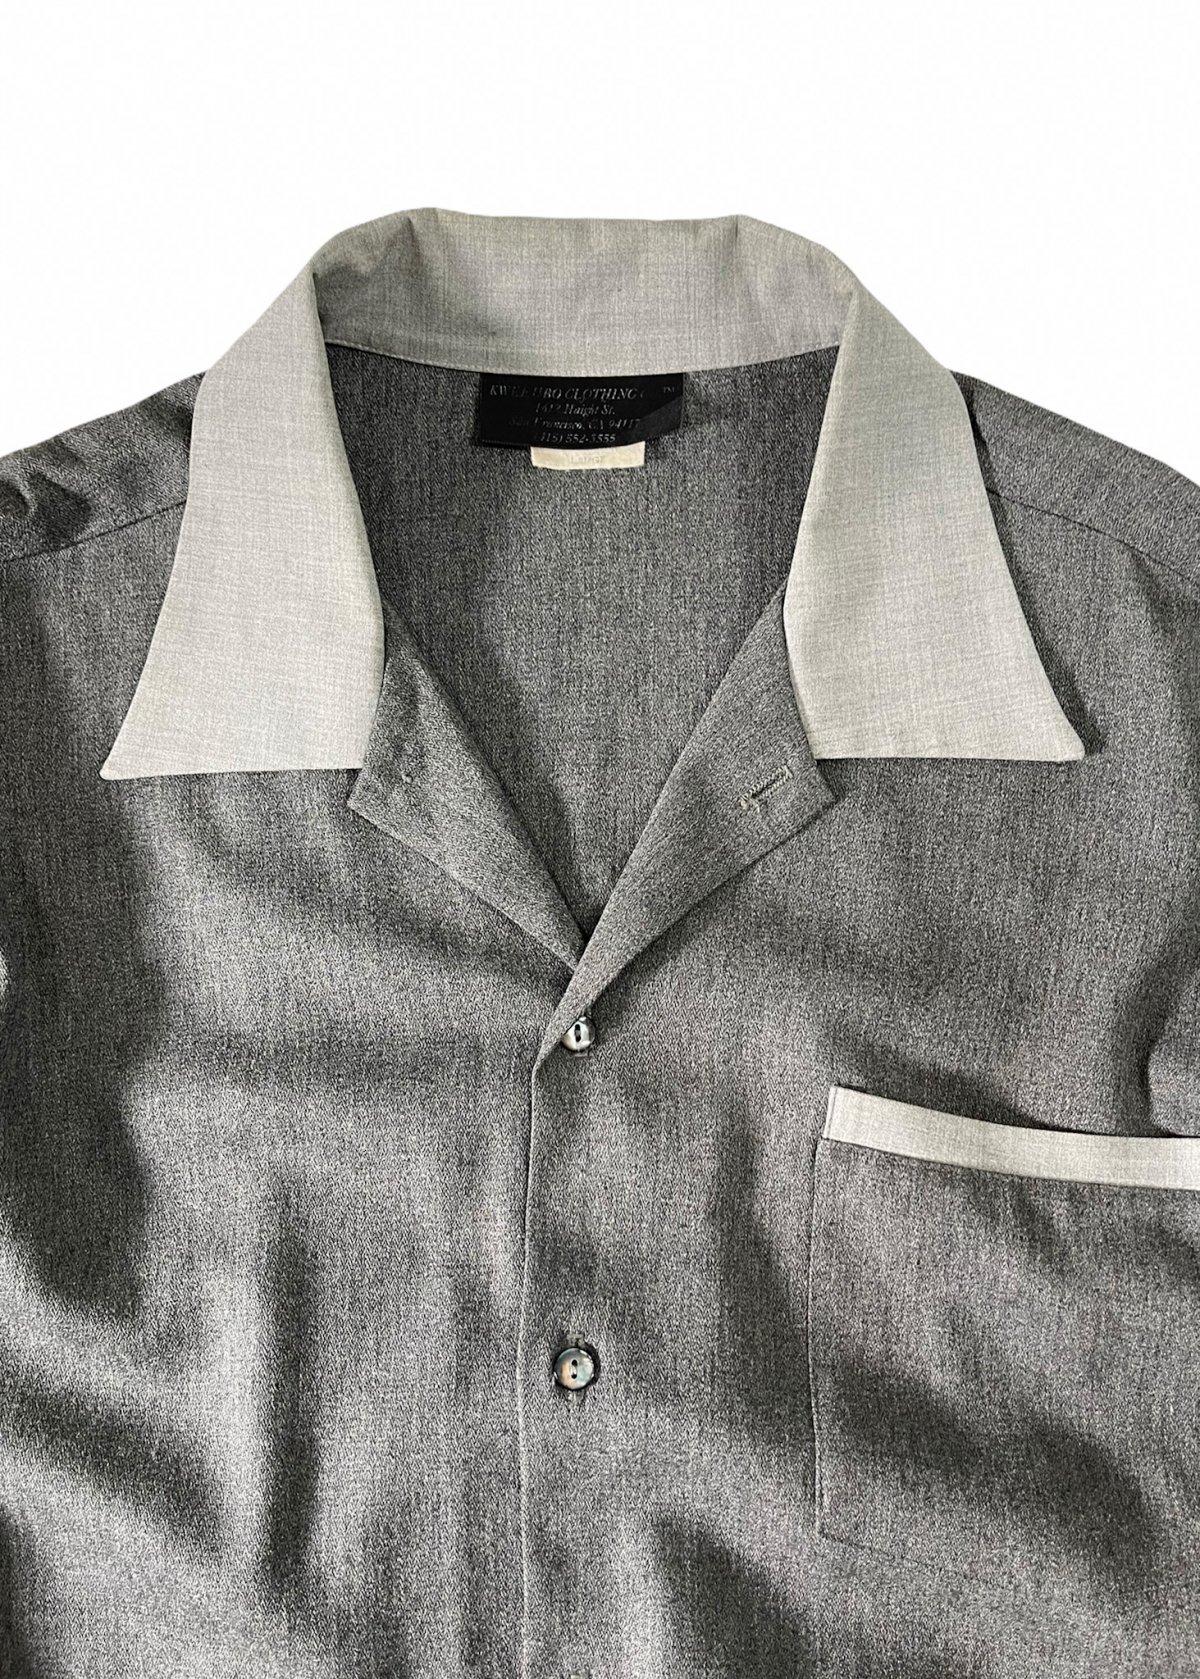 I&I 古着 通販 Vintage Wool Mix wide Shirt 詳細画像2